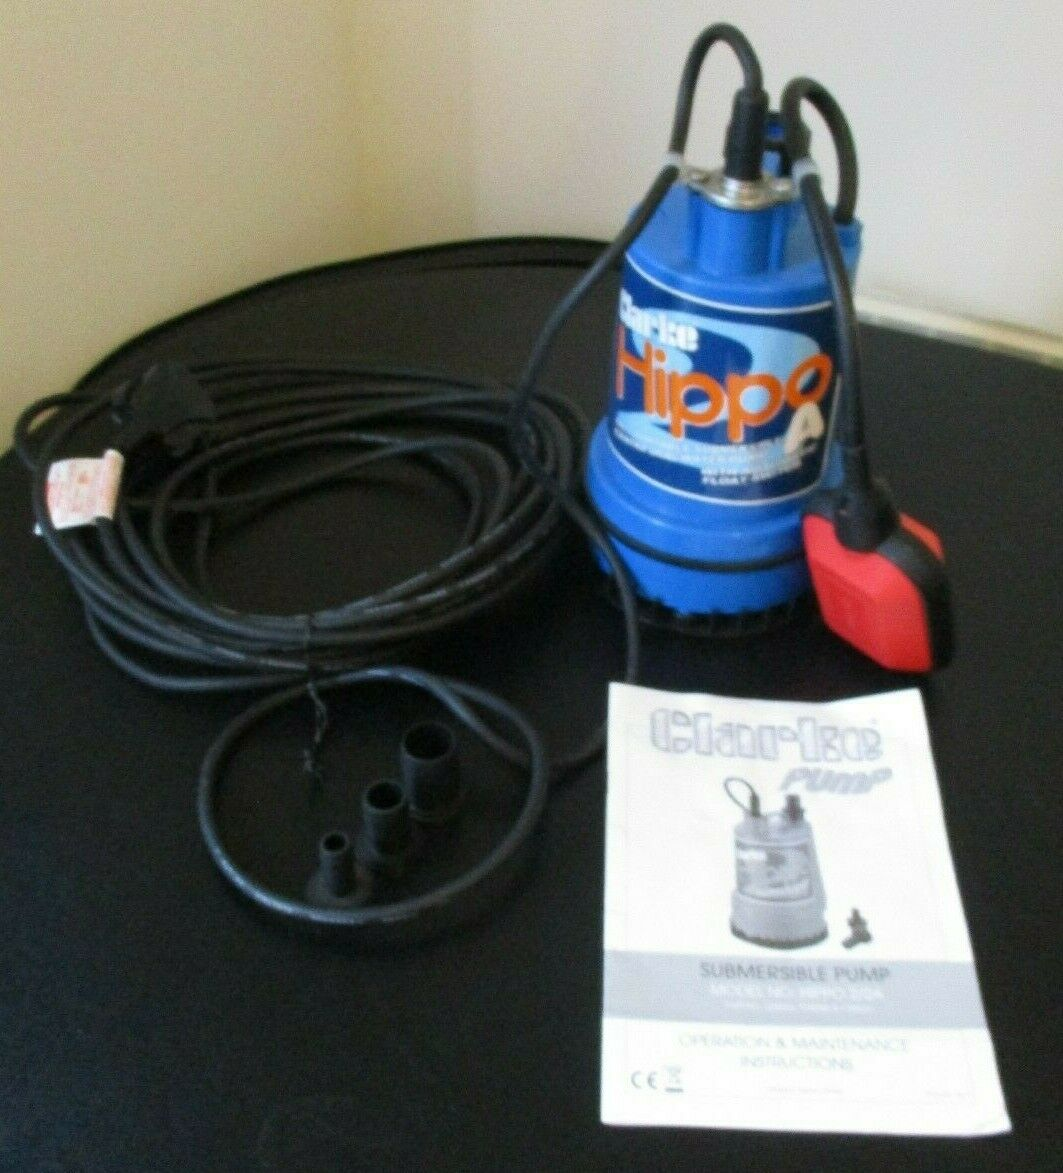 Clarke Submersible Pump Model Hippo 2/2A c/w Instructions Warrington WA5 8QN